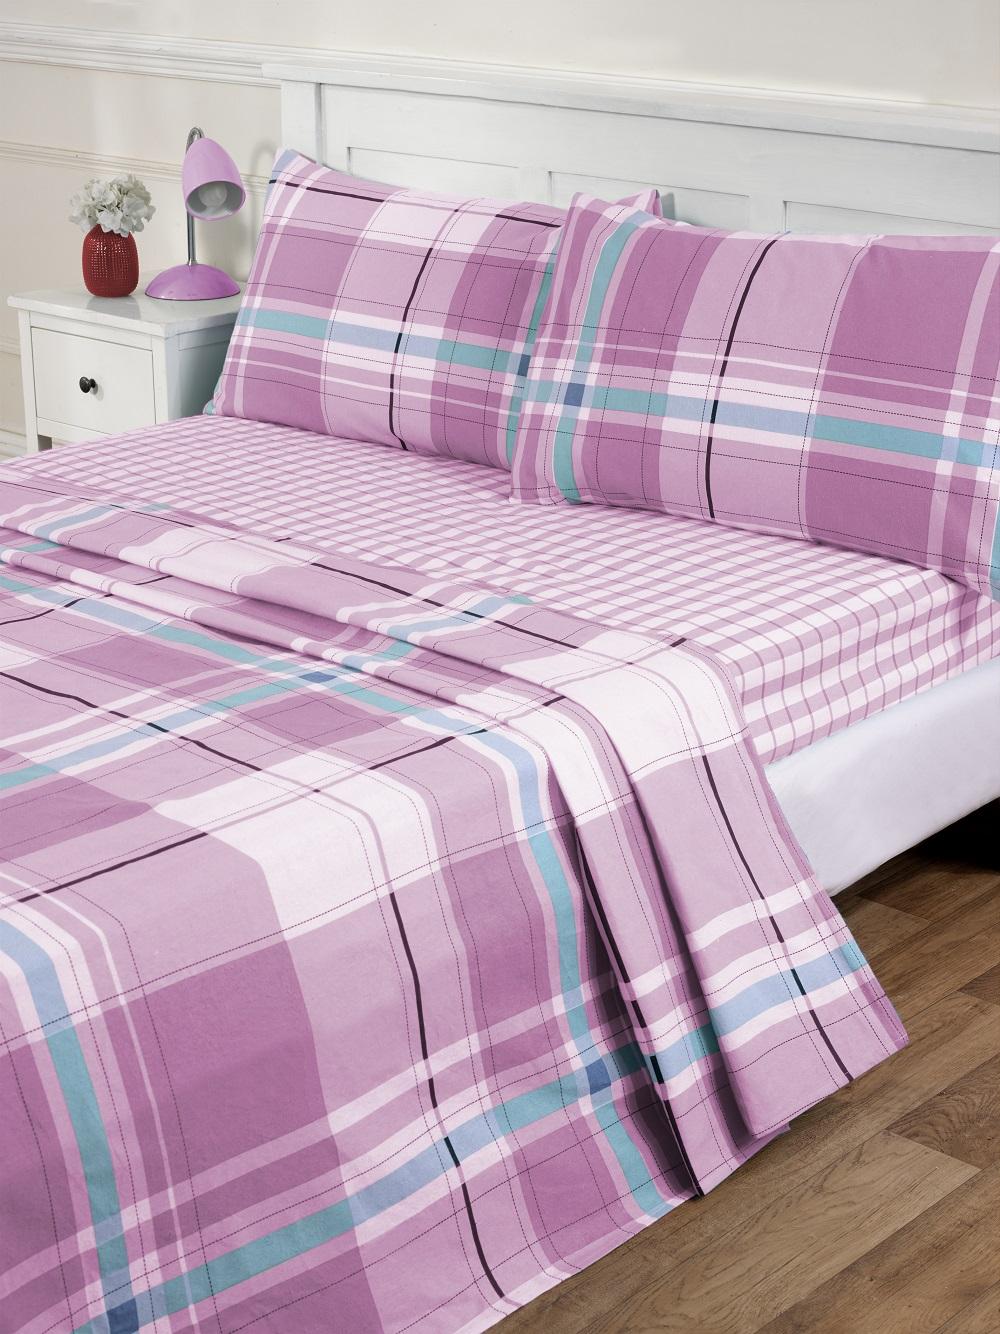 atlanta flannelette pink sheets set fitted flat pillowcase. Black Bedroom Furniture Sets. Home Design Ideas